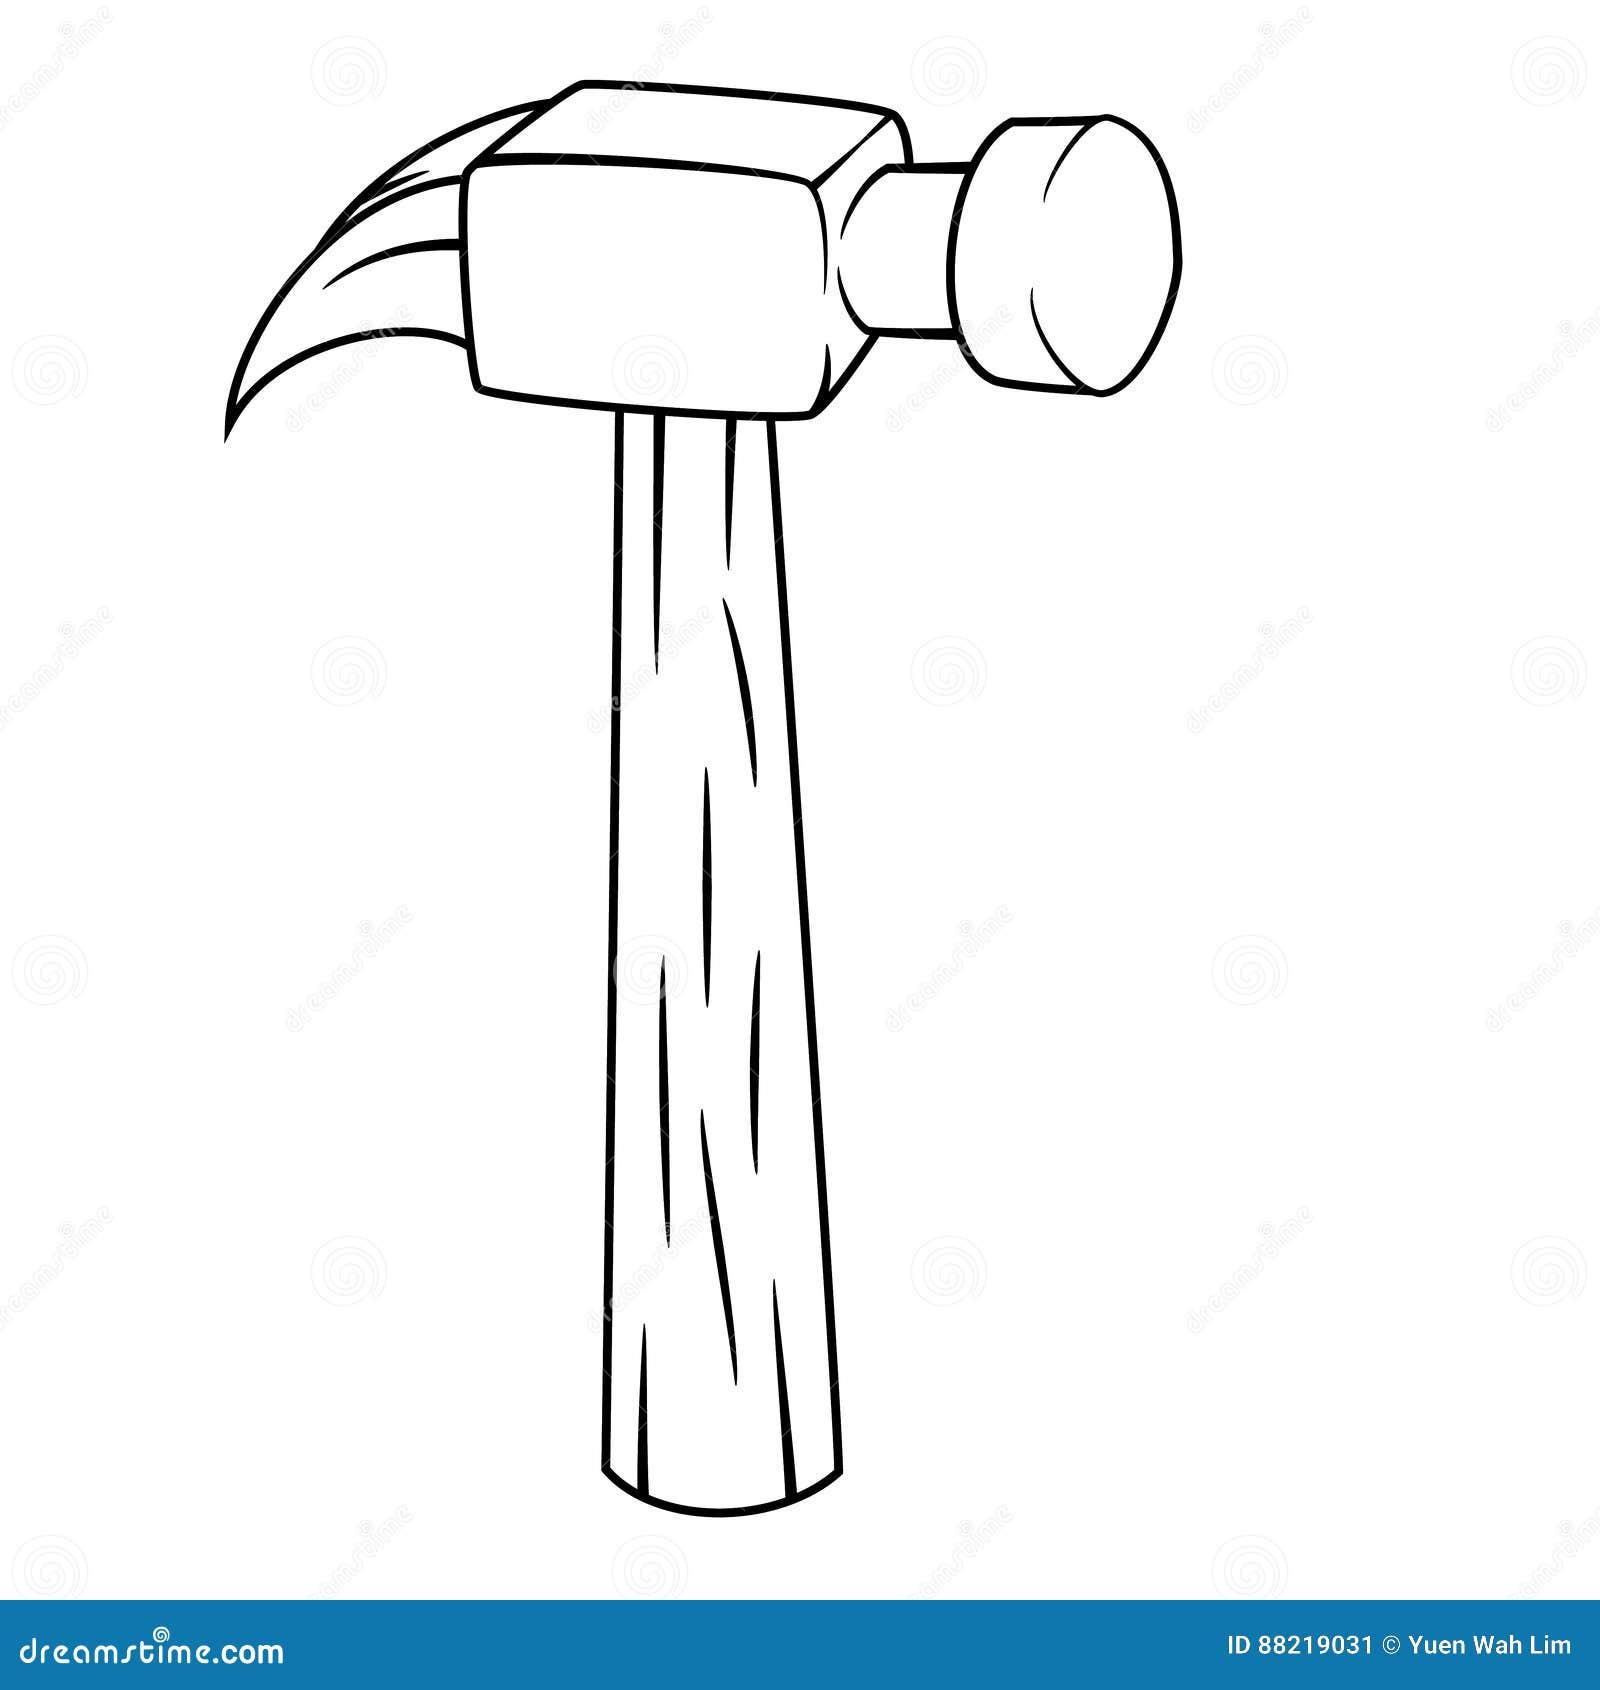 Dibujo aislado de la historieta del martillo ilustraci n - Dessin de marteau ...